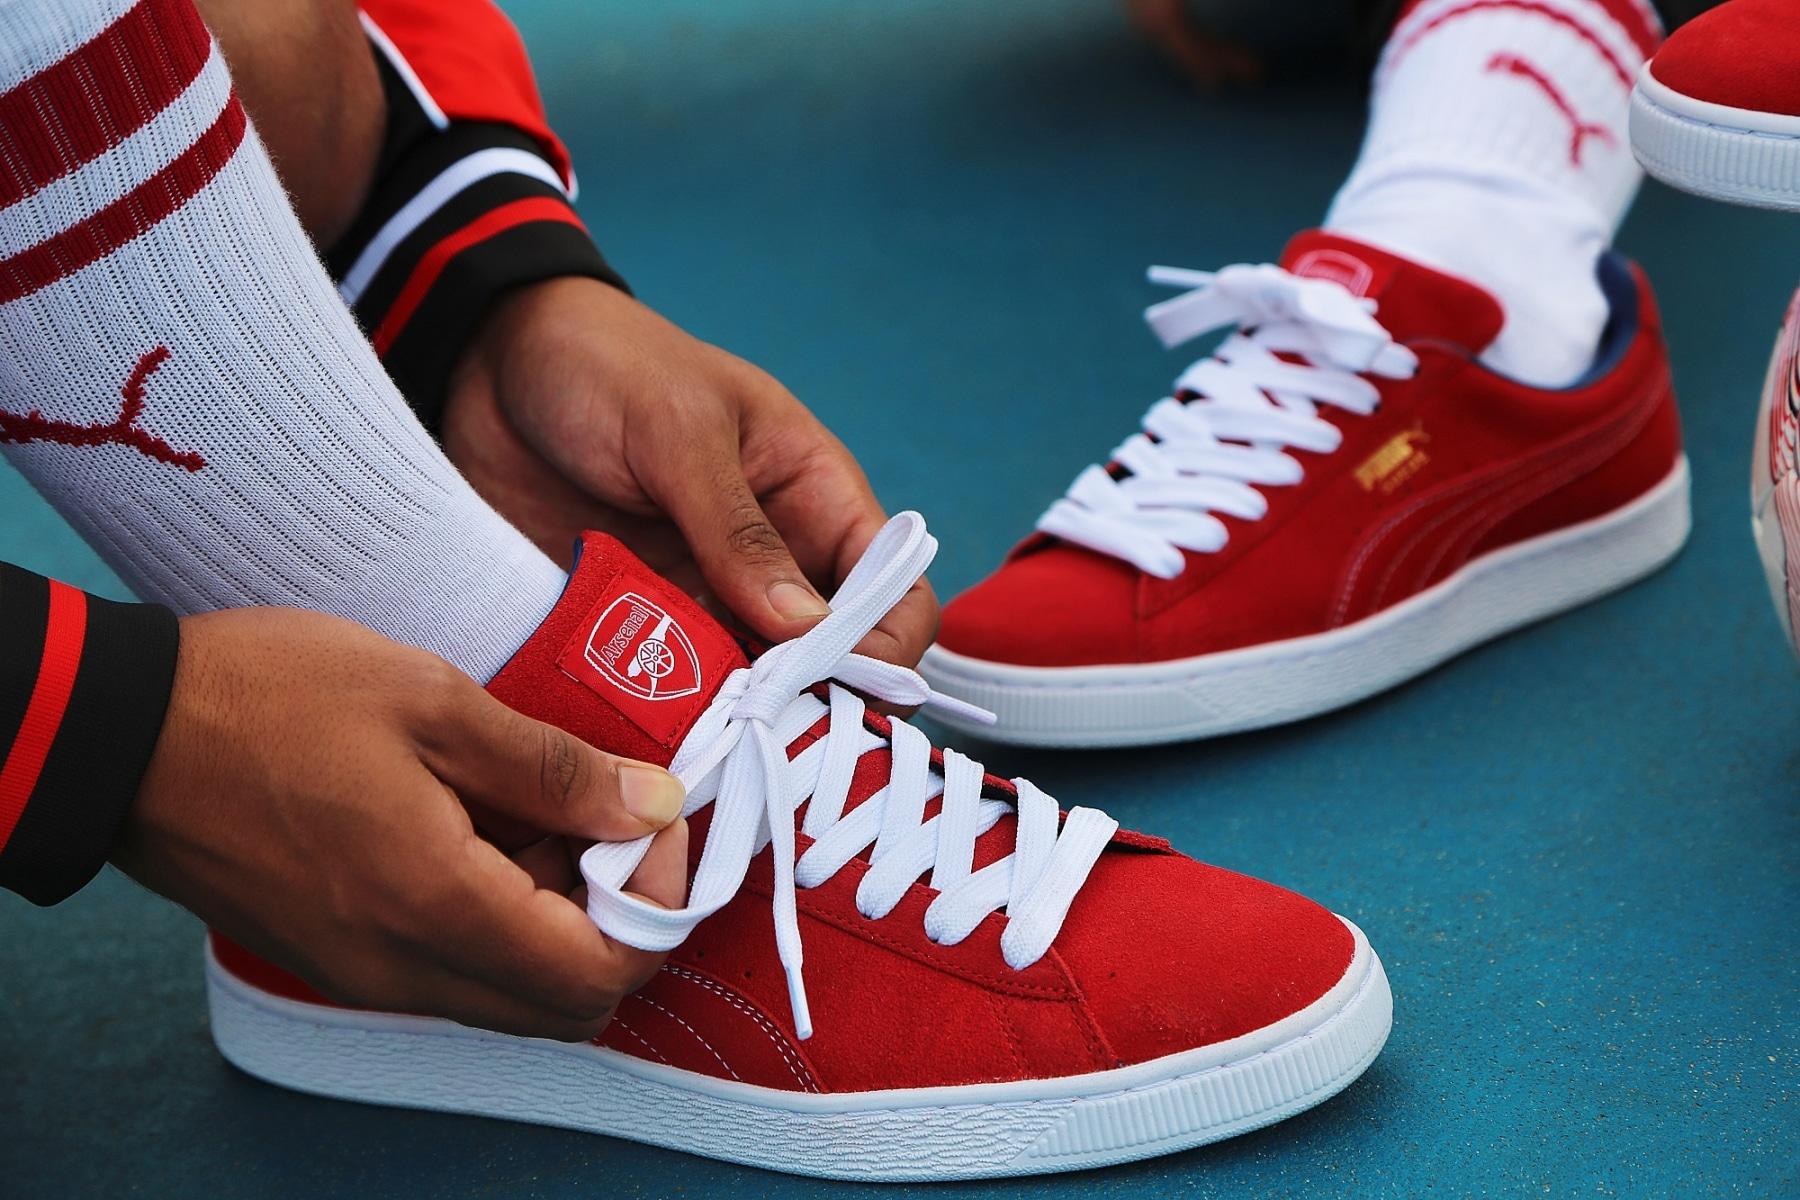 arsenal puma sneakers strap